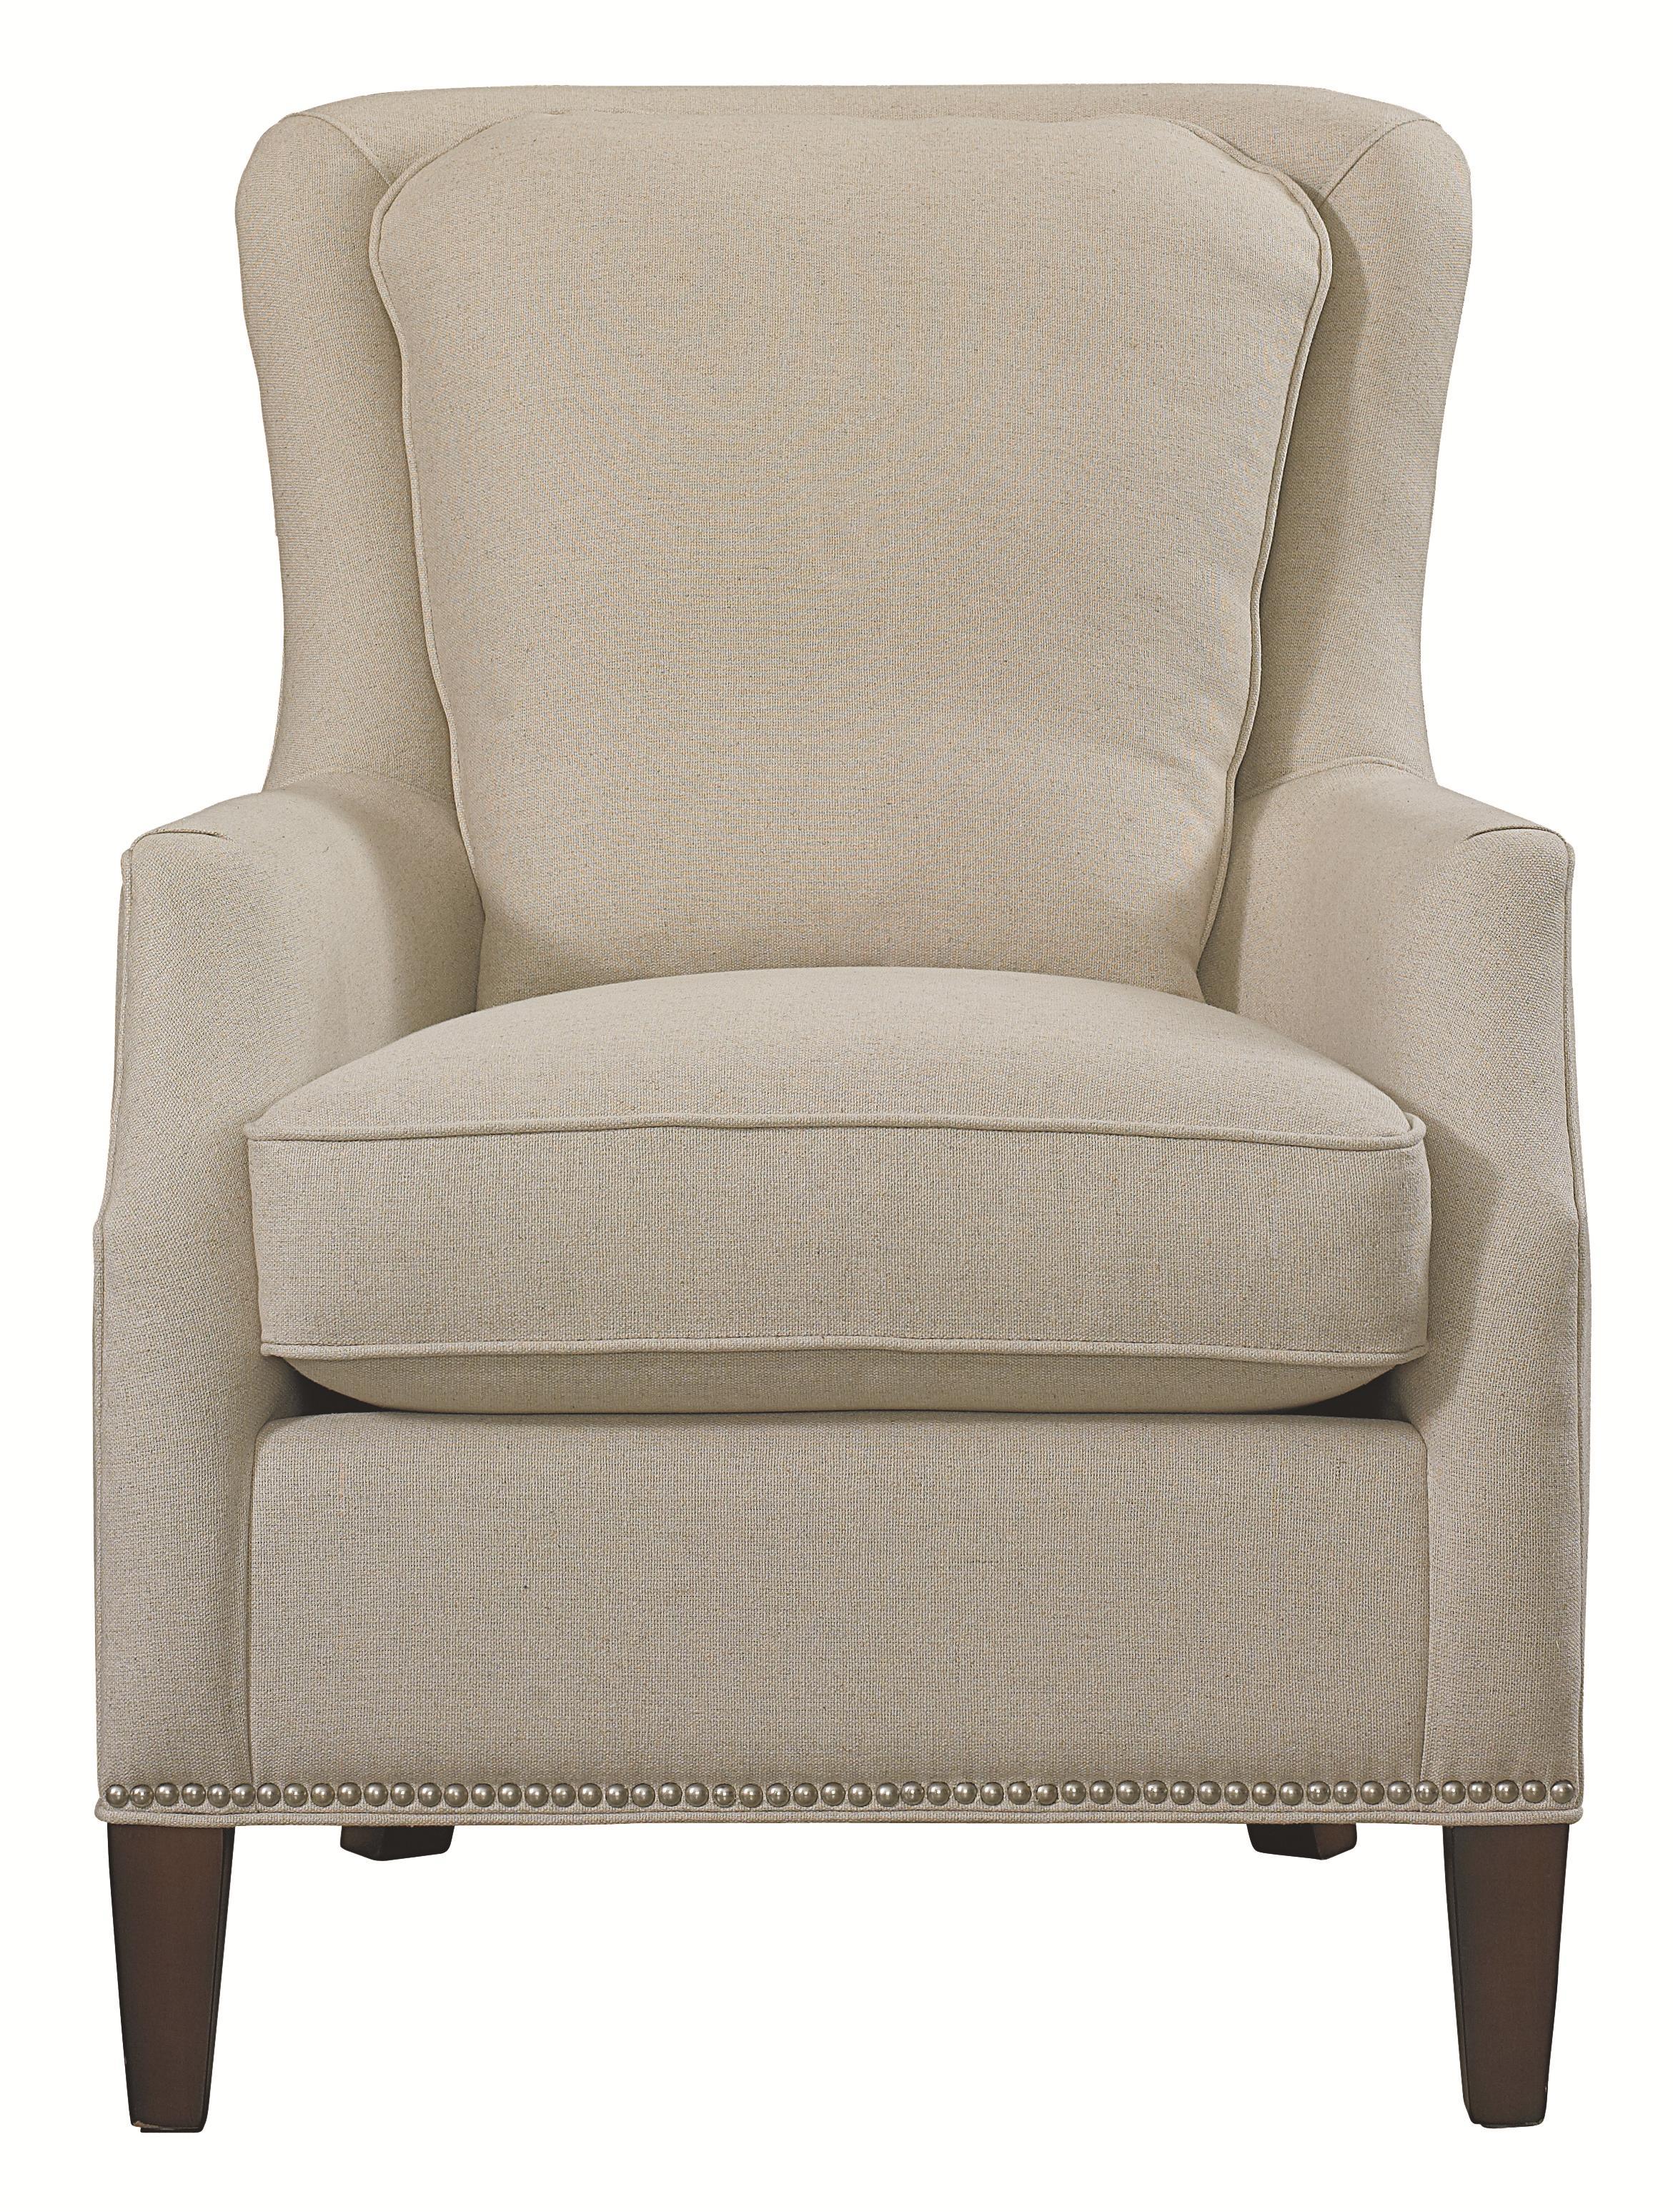 Bassett Accent Chairs By BassettKent Accent Chair ...